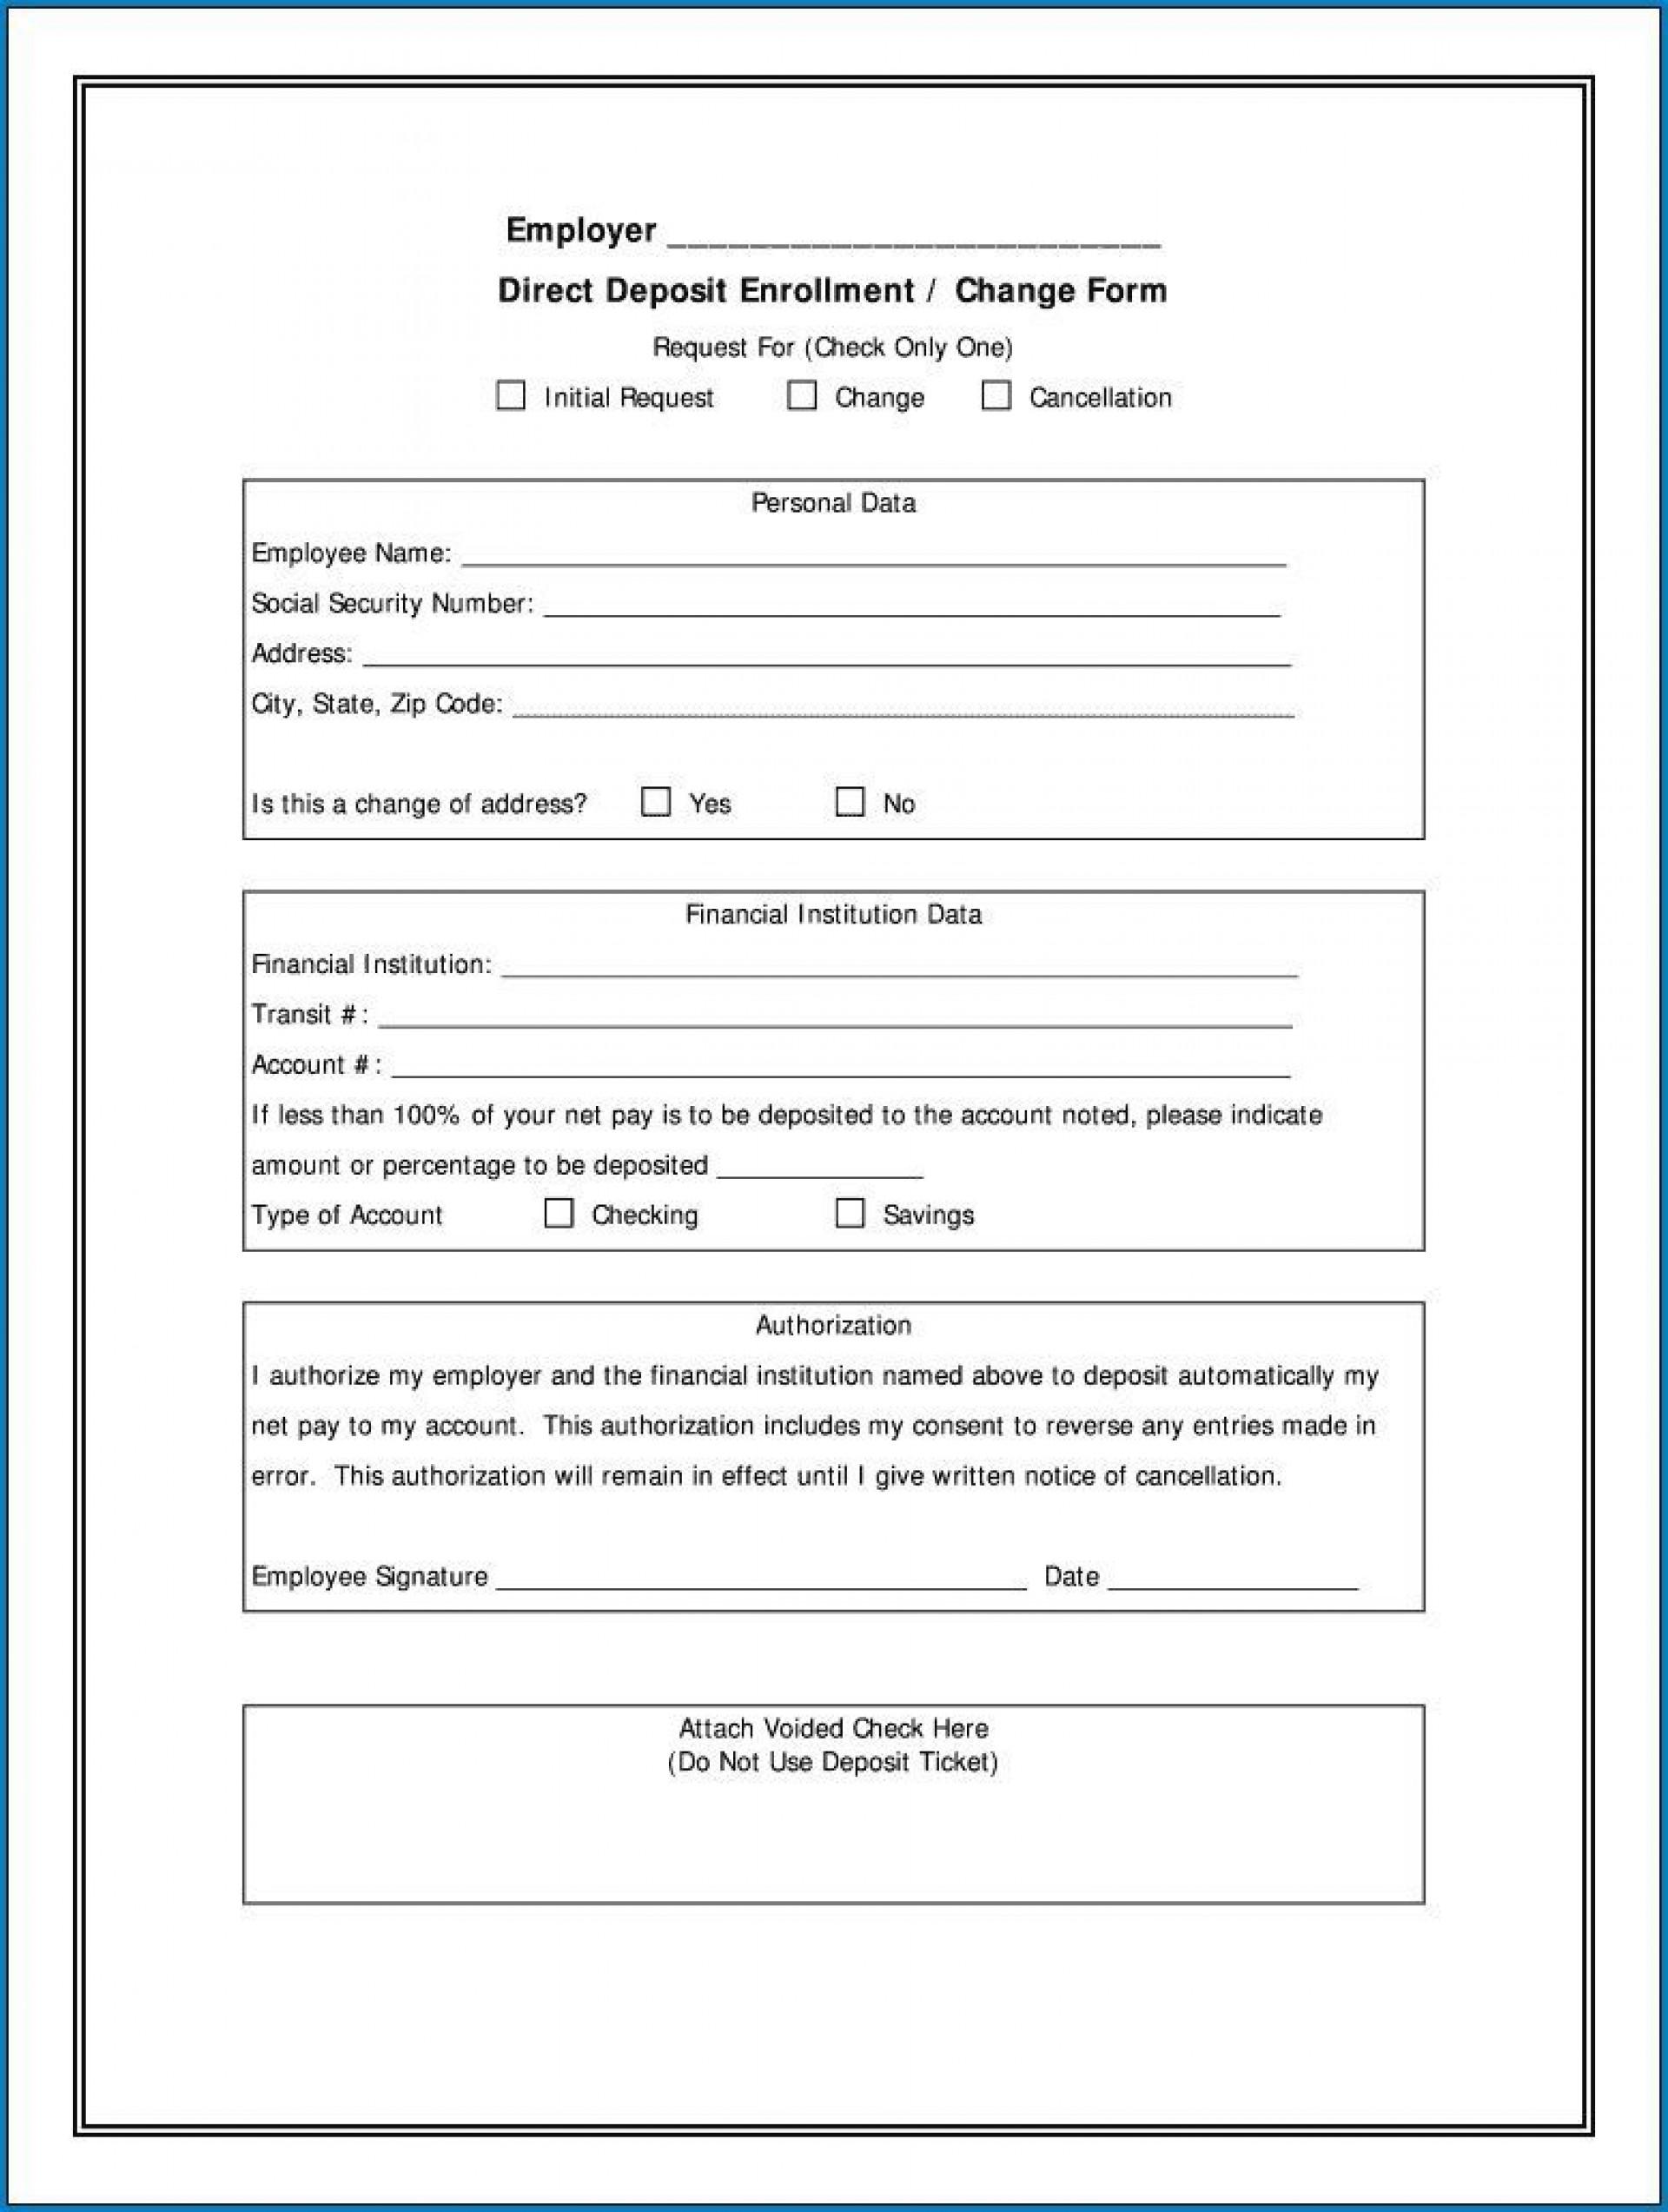 000 Marvelou Direct Deposit Agreement Authorization Form Template Idea 1920